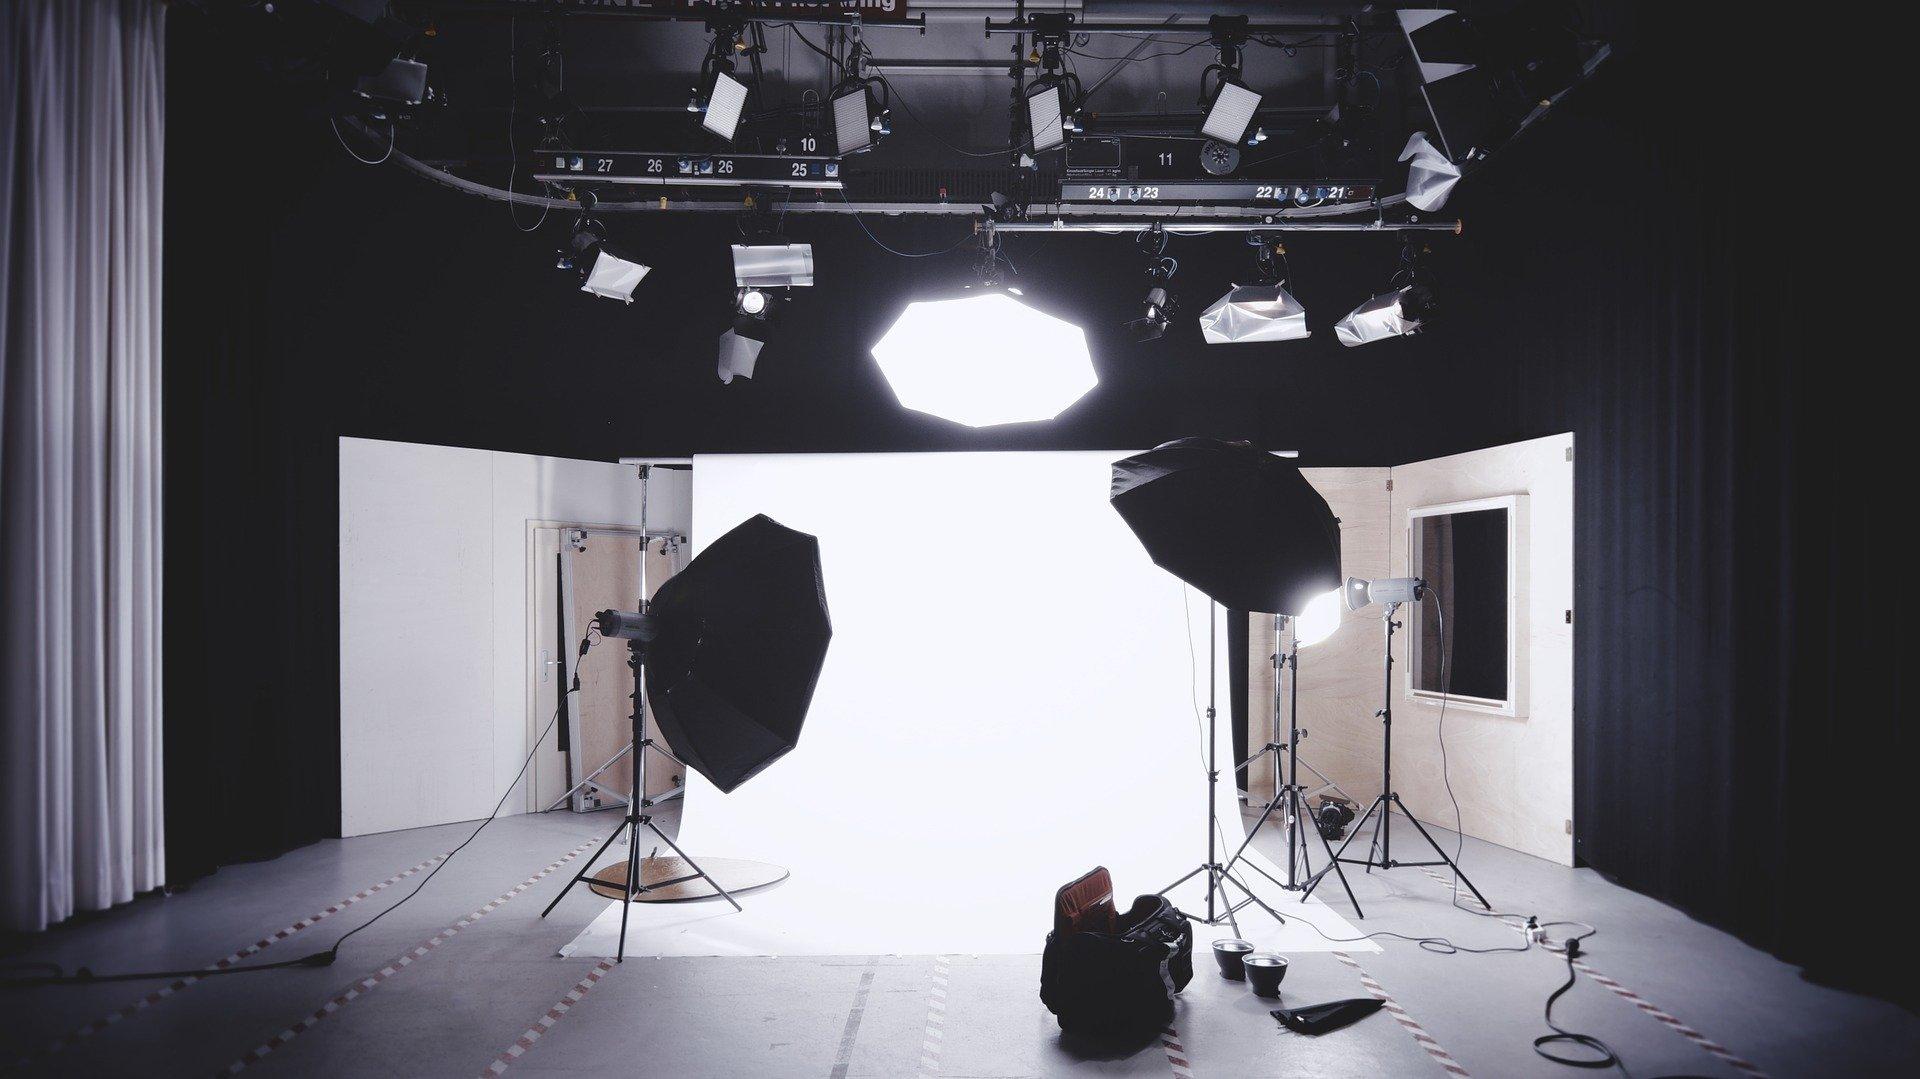 TikTok Content Produktion im Studio